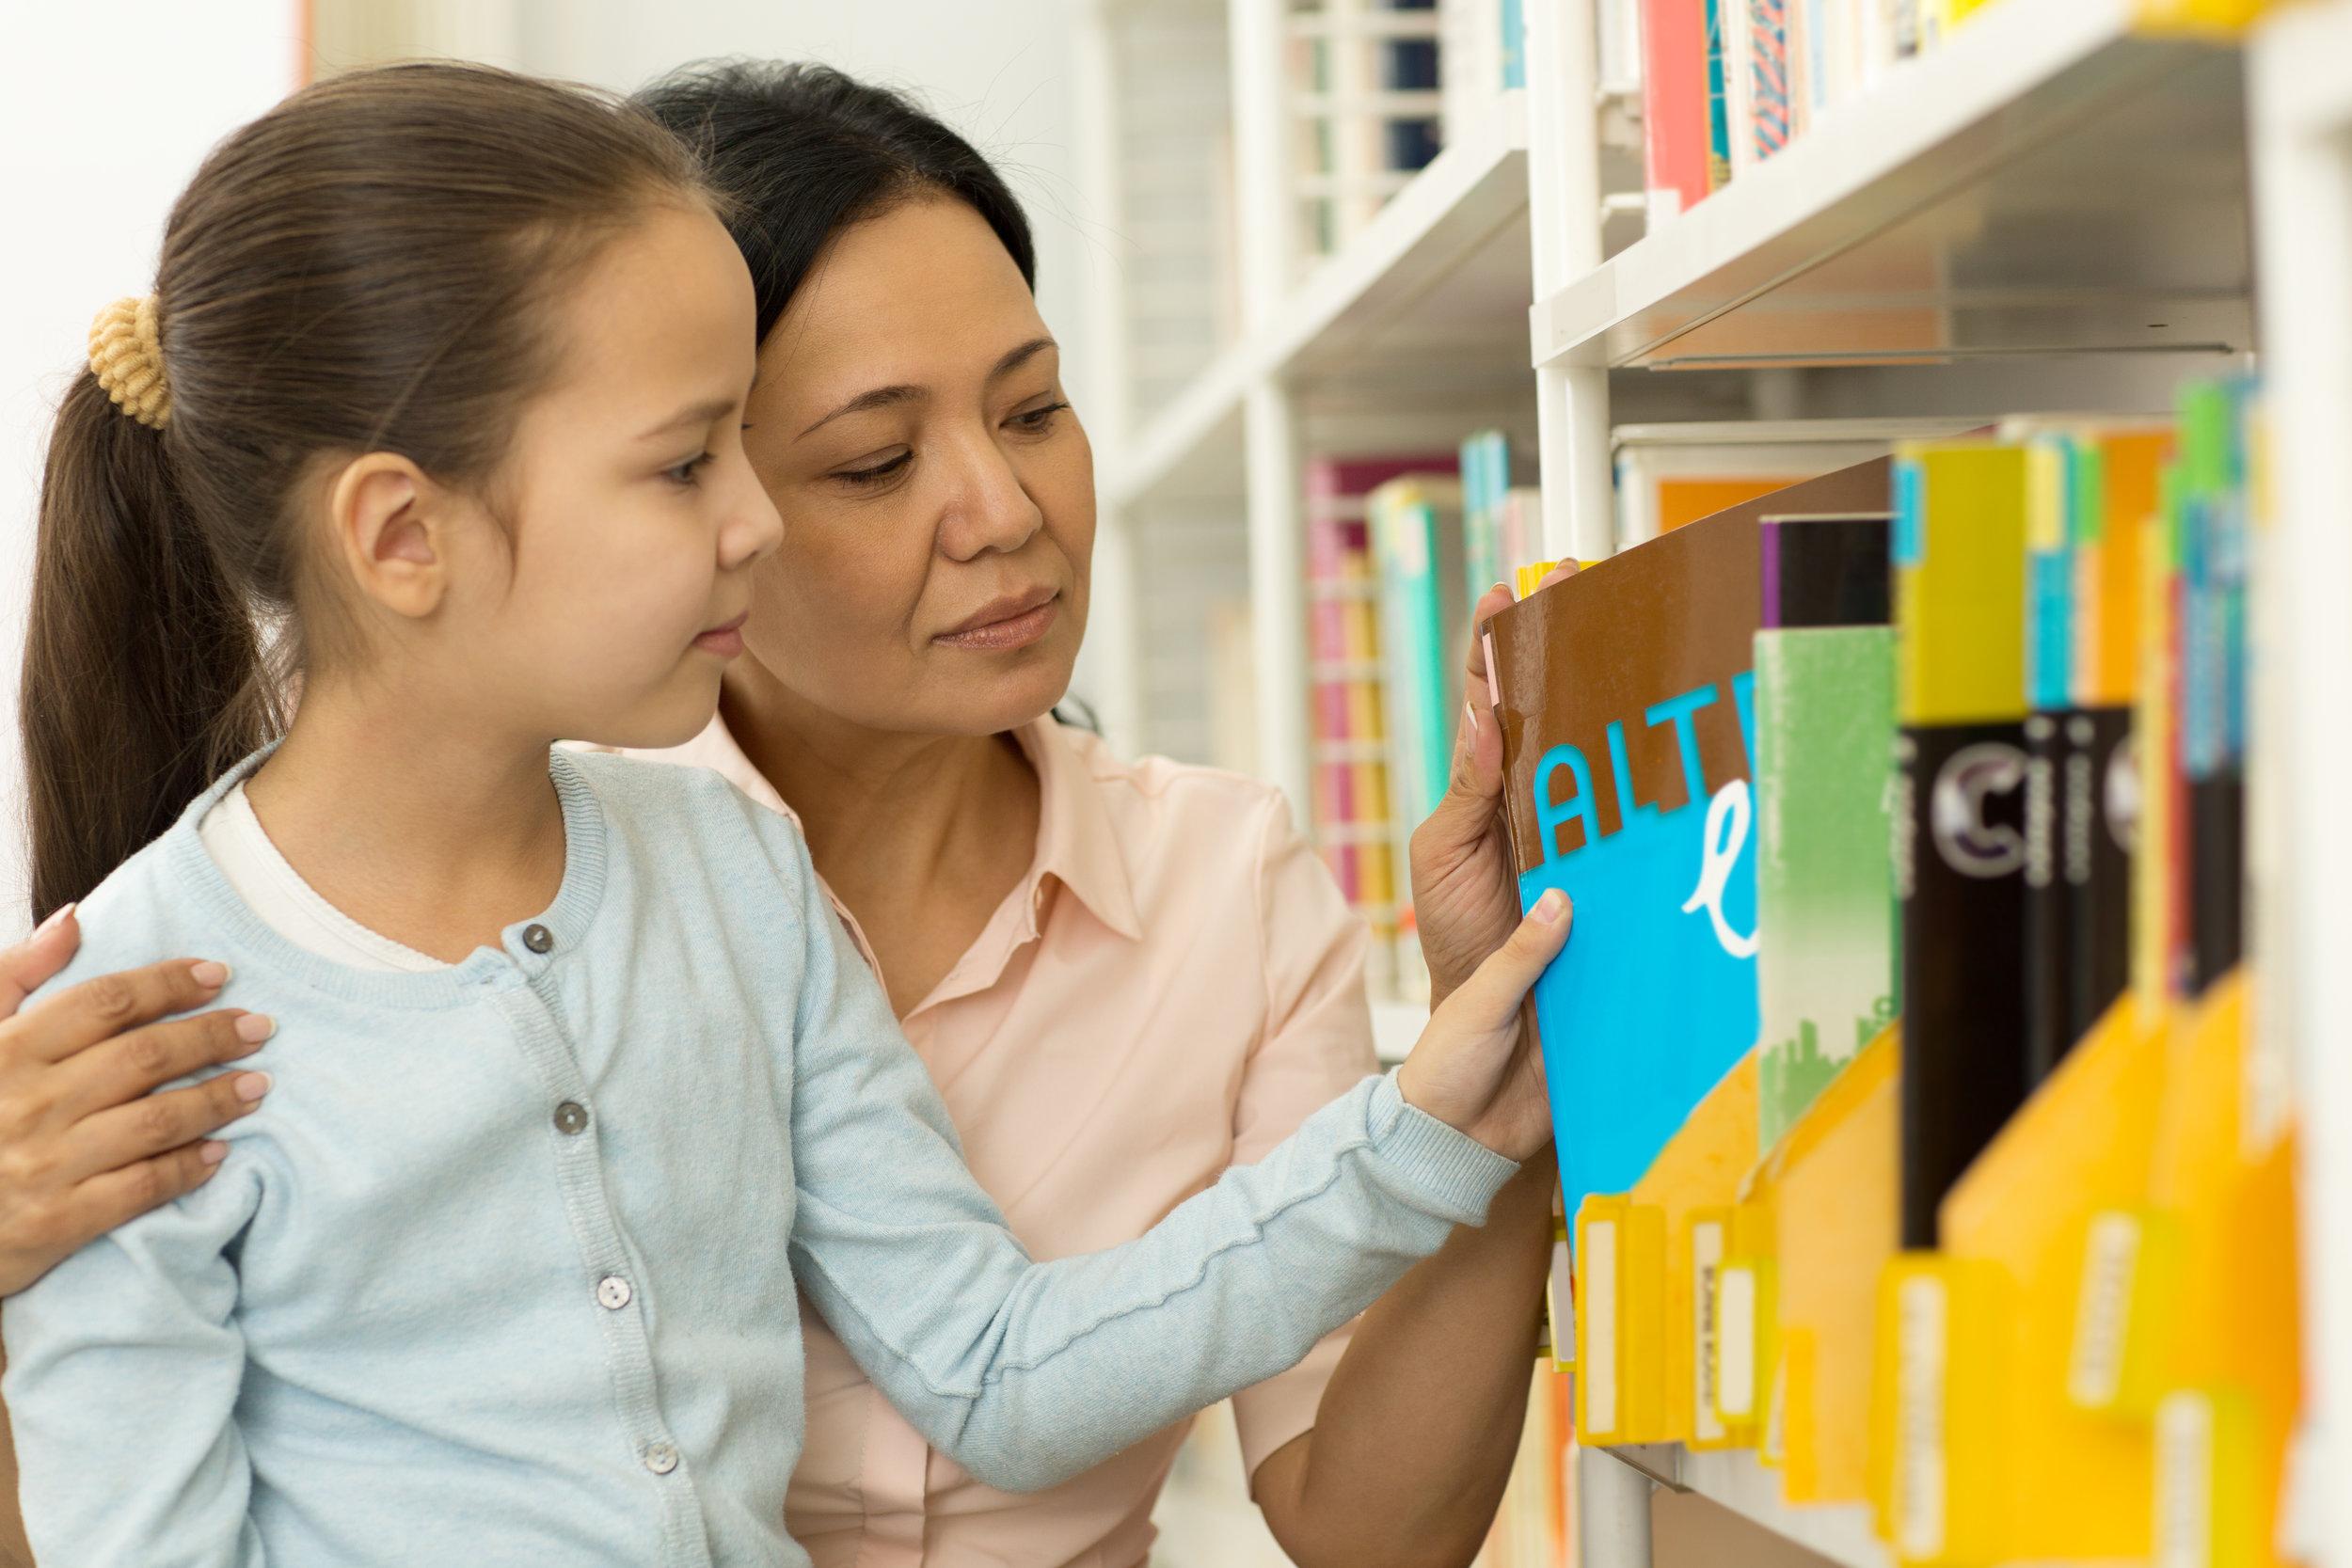 choose foreign language learning homeschool curriculum.jpg